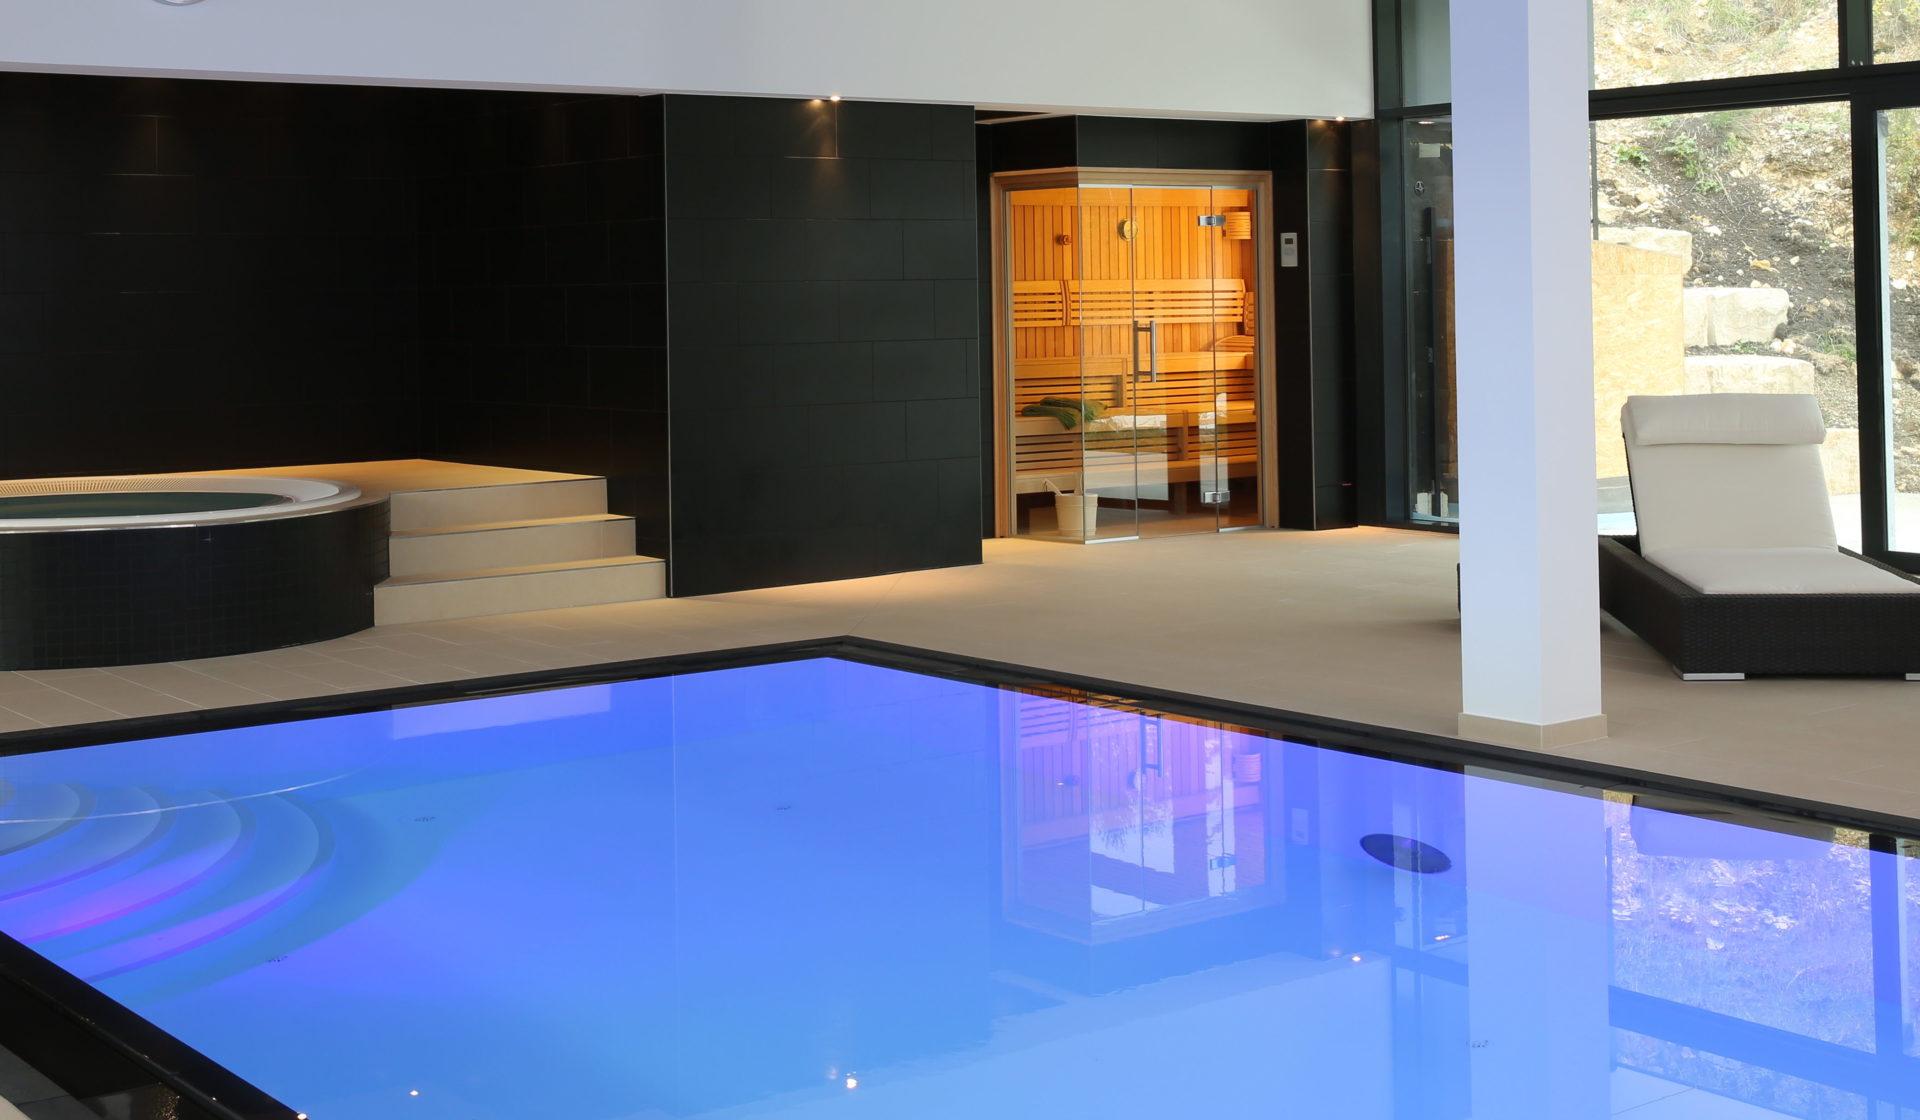 Pool RUKU Sauna Thermium Wellness RUKU Schweiz Offizielle Vertretung RR Variationen GmbH RRV